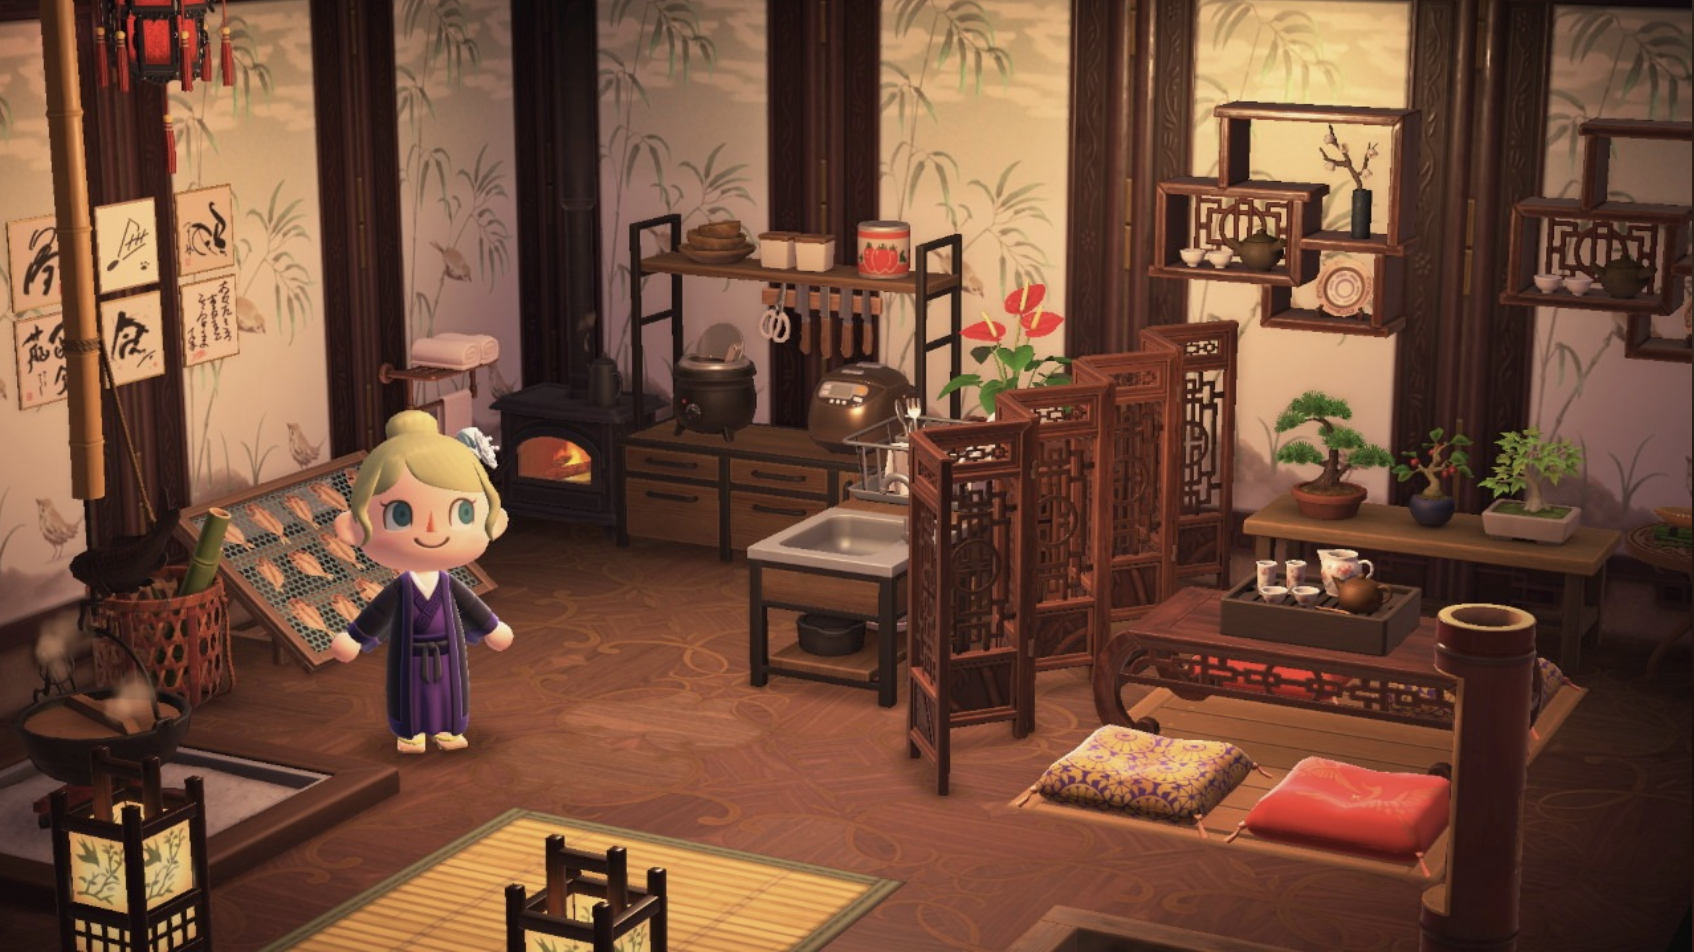 Animal Crossing Room Design Tips Using Dividers And Rugs Room Design Animal Crossing Design